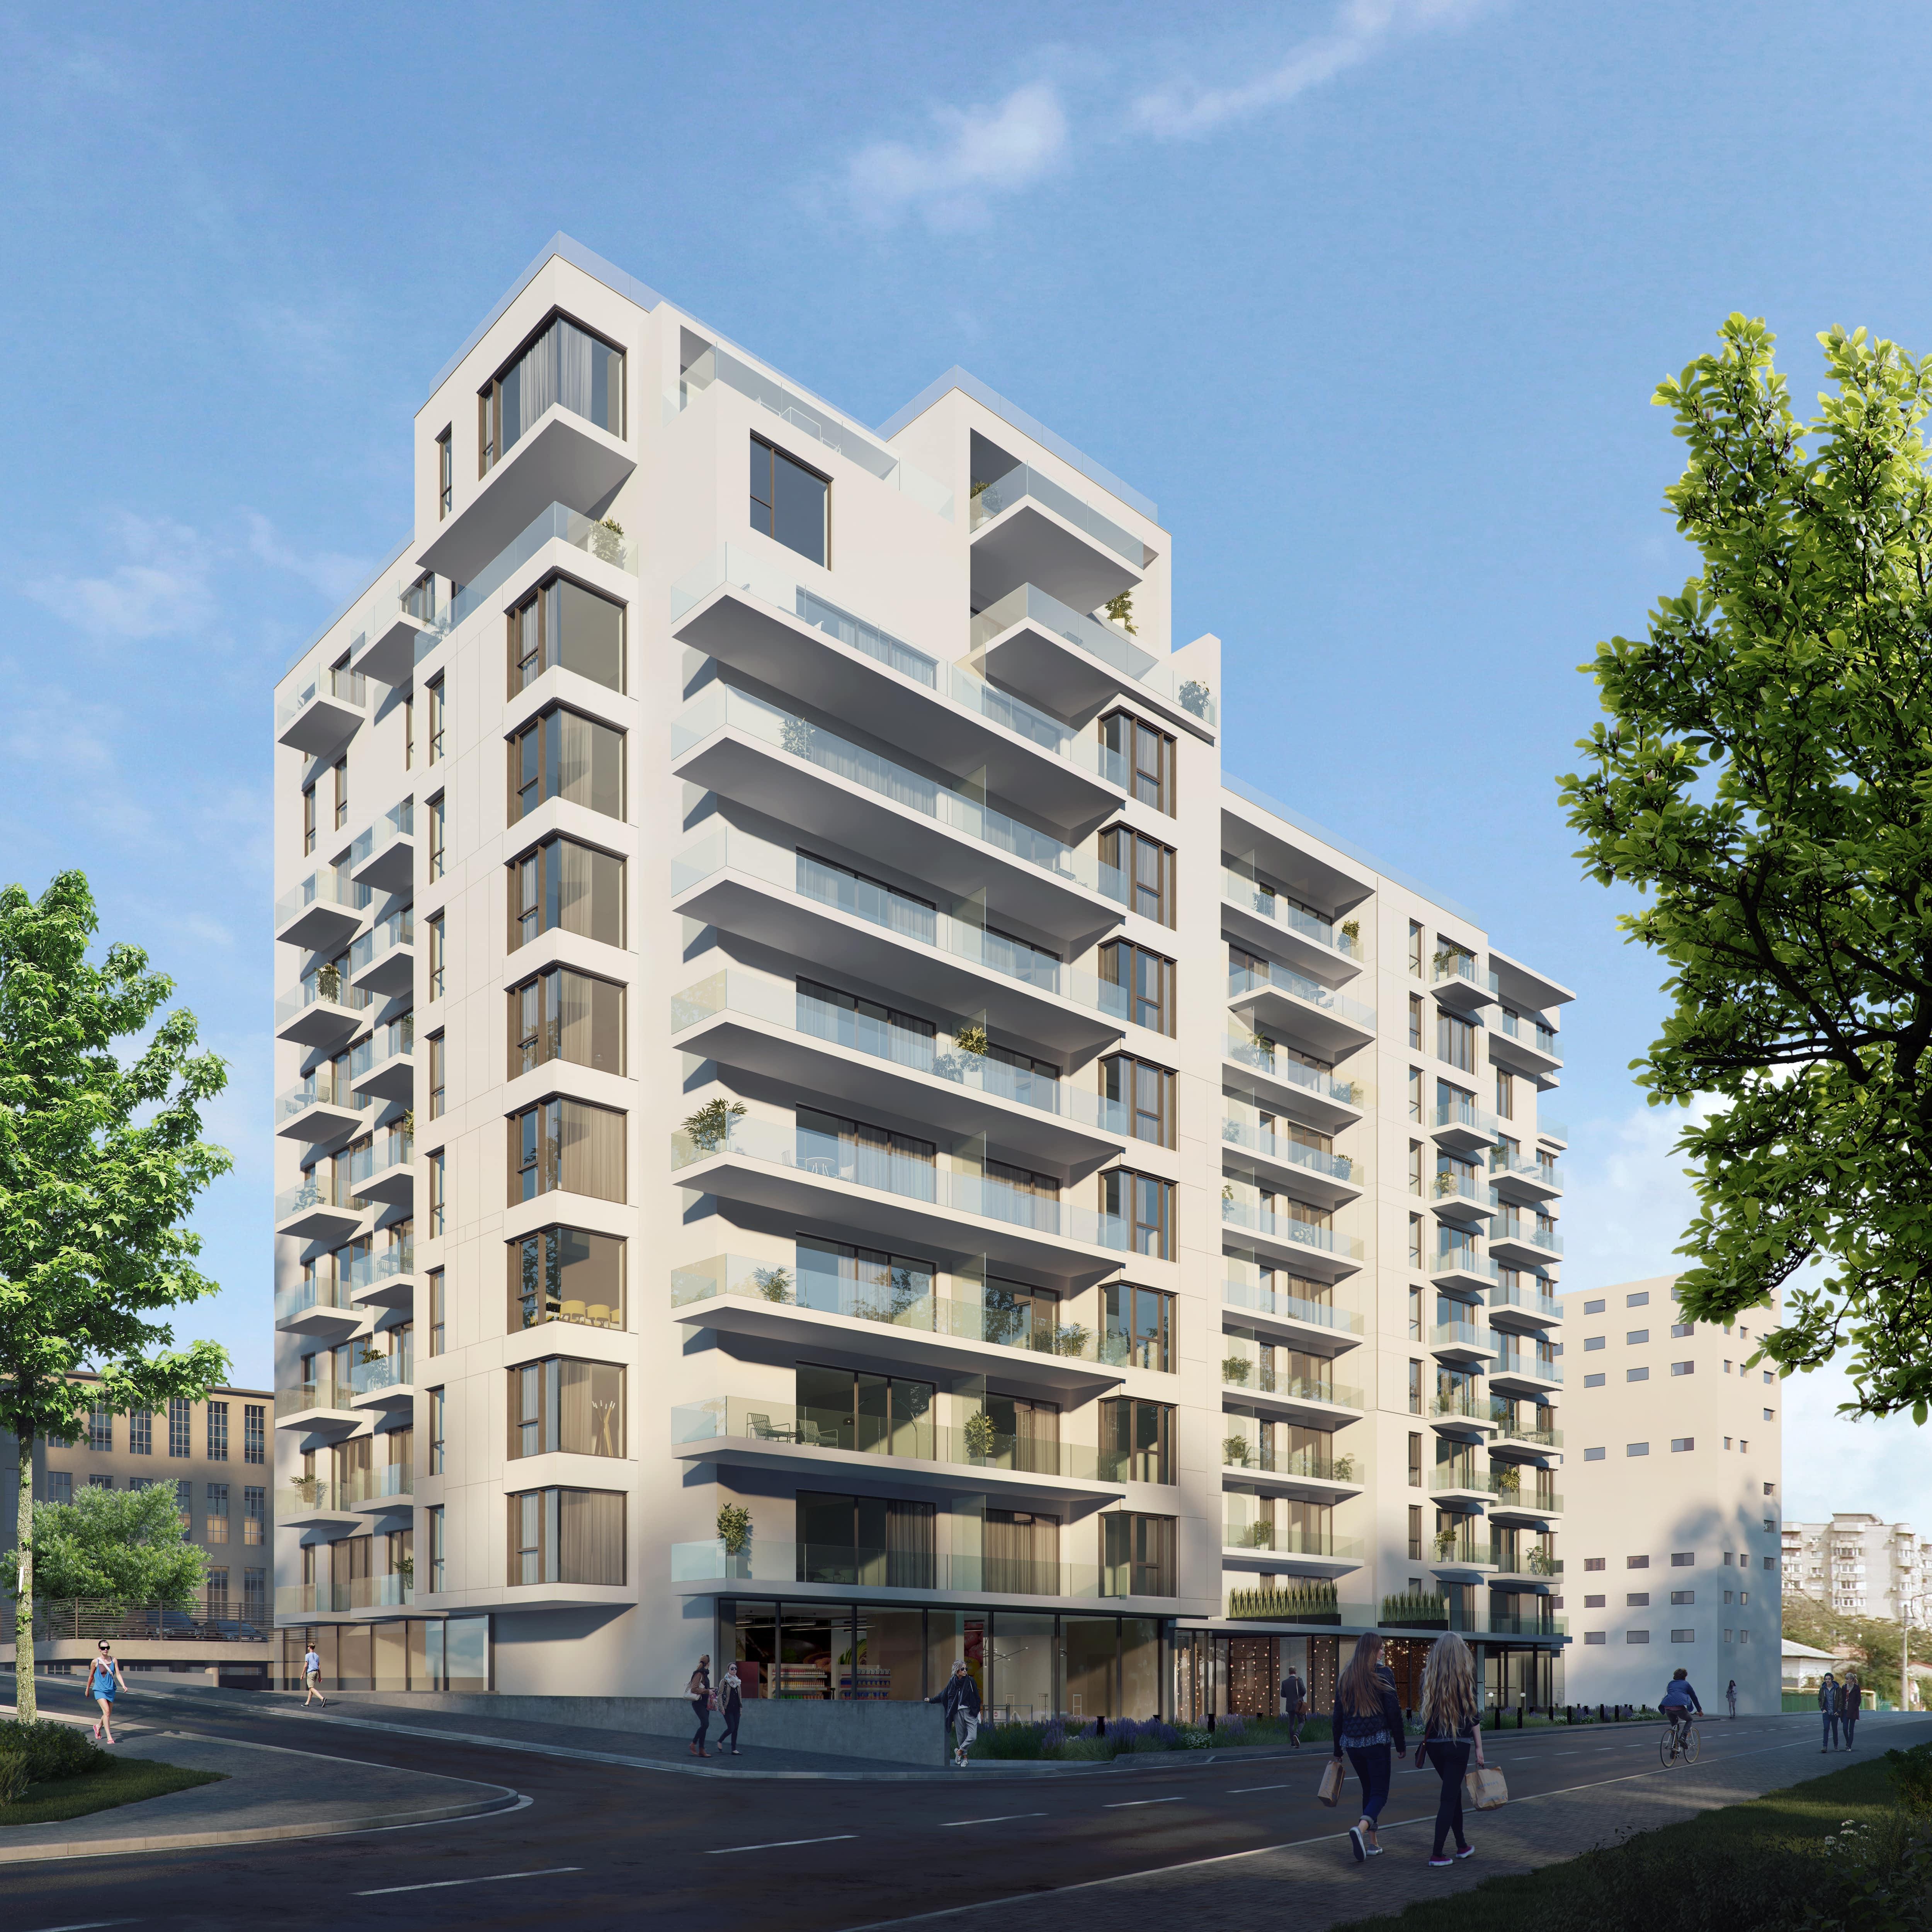 https://ahe-ro.s3.amazonaws.com/10808/penthouse-si-apartamente-unirii-%286%29.jpg